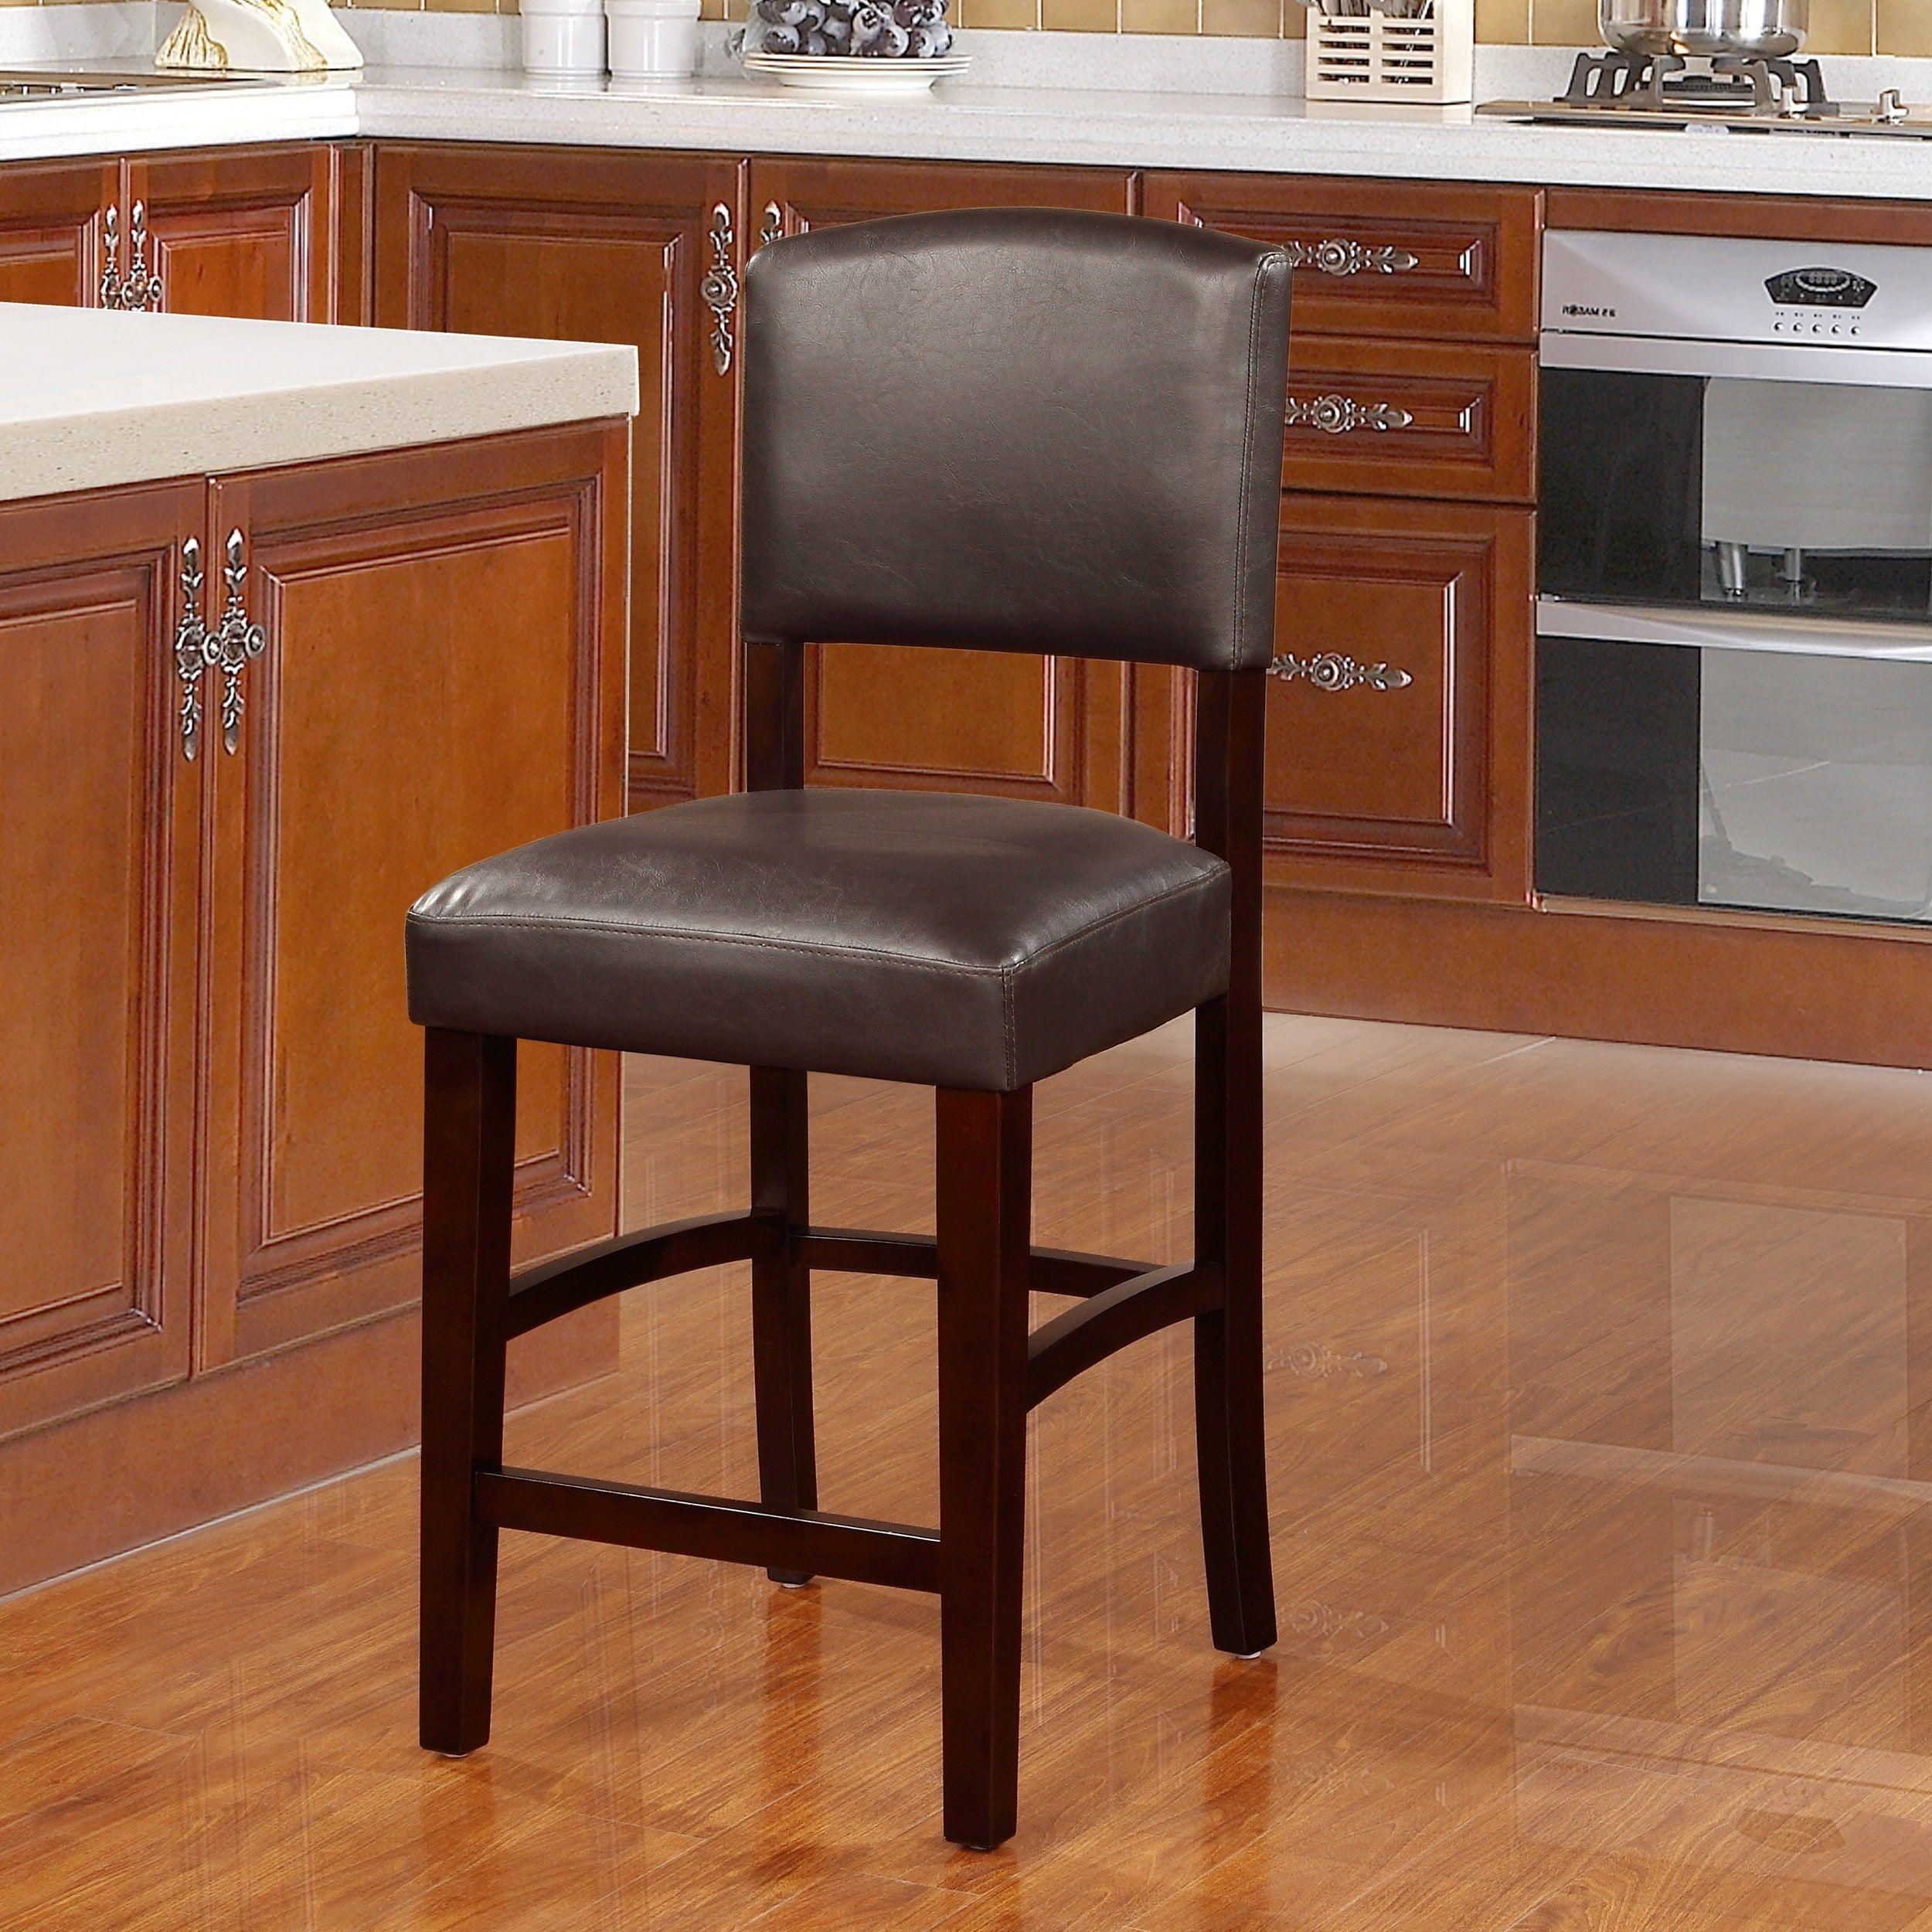 Stupendous Linon Monte Carlo Espresso Counter Stool Vinyl Padding As Machost Co Dining Chair Design Ideas Machostcouk